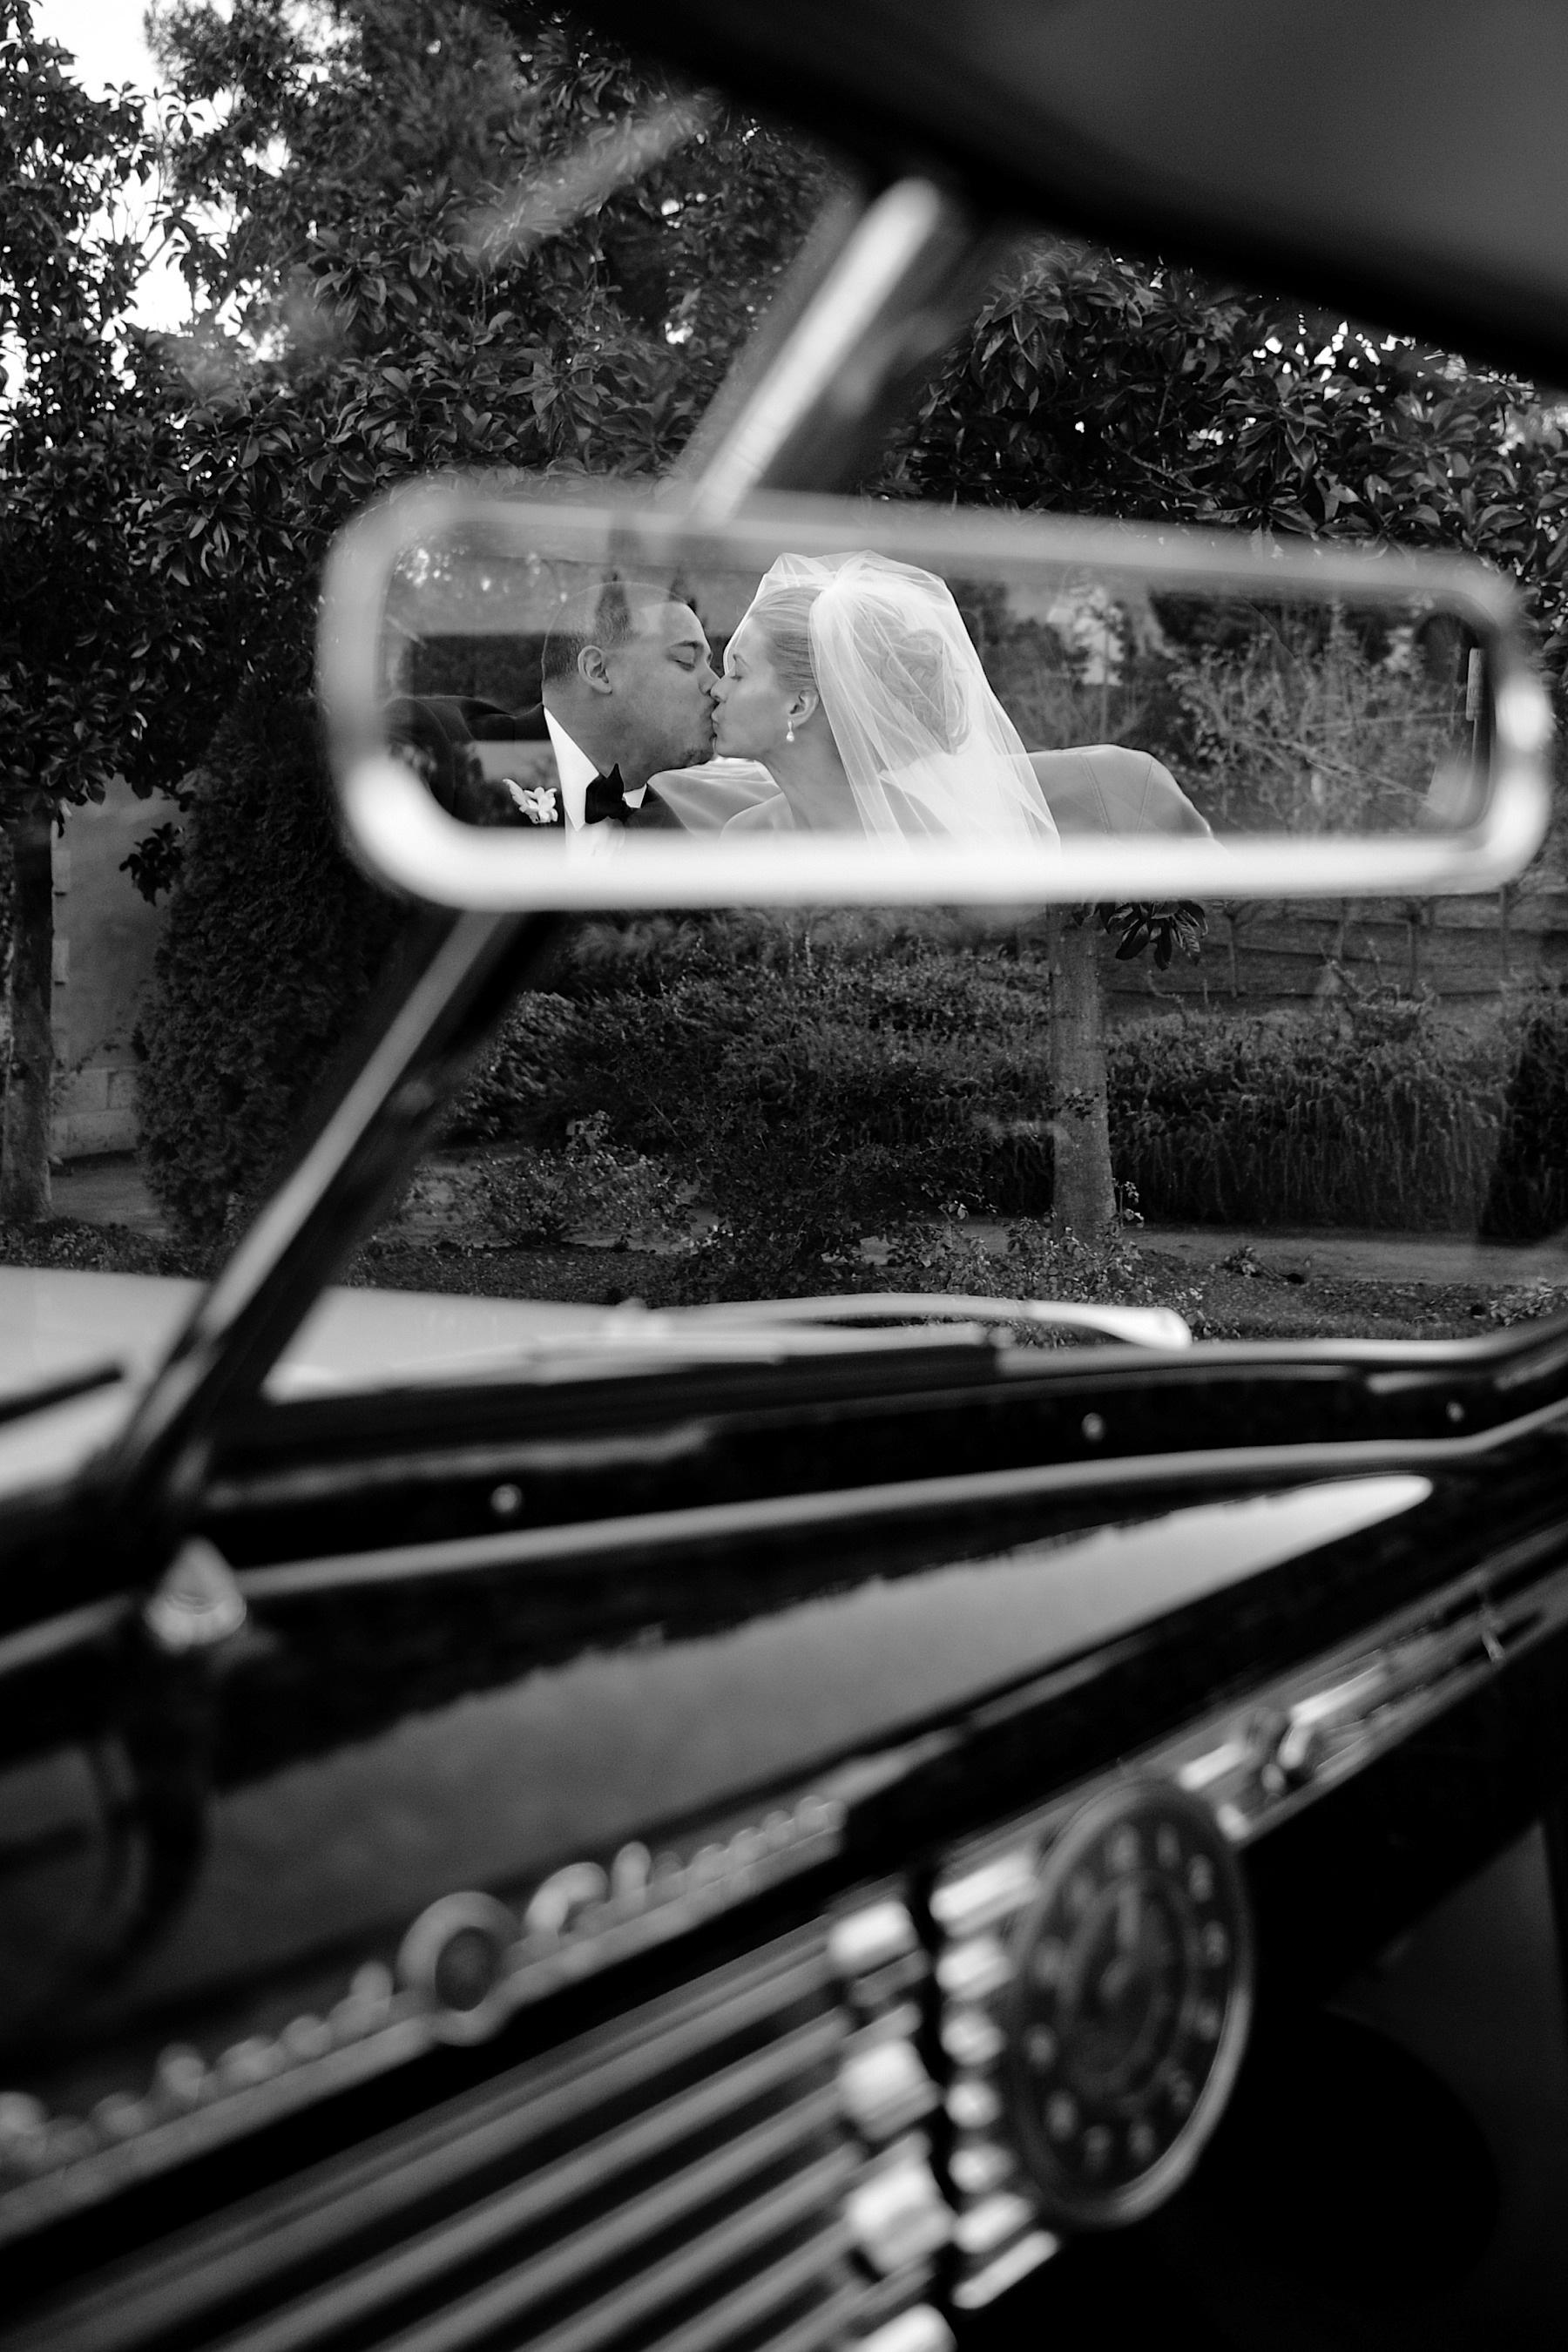 culinary_institute_of_america_napa_valley_wedding_059photographer_